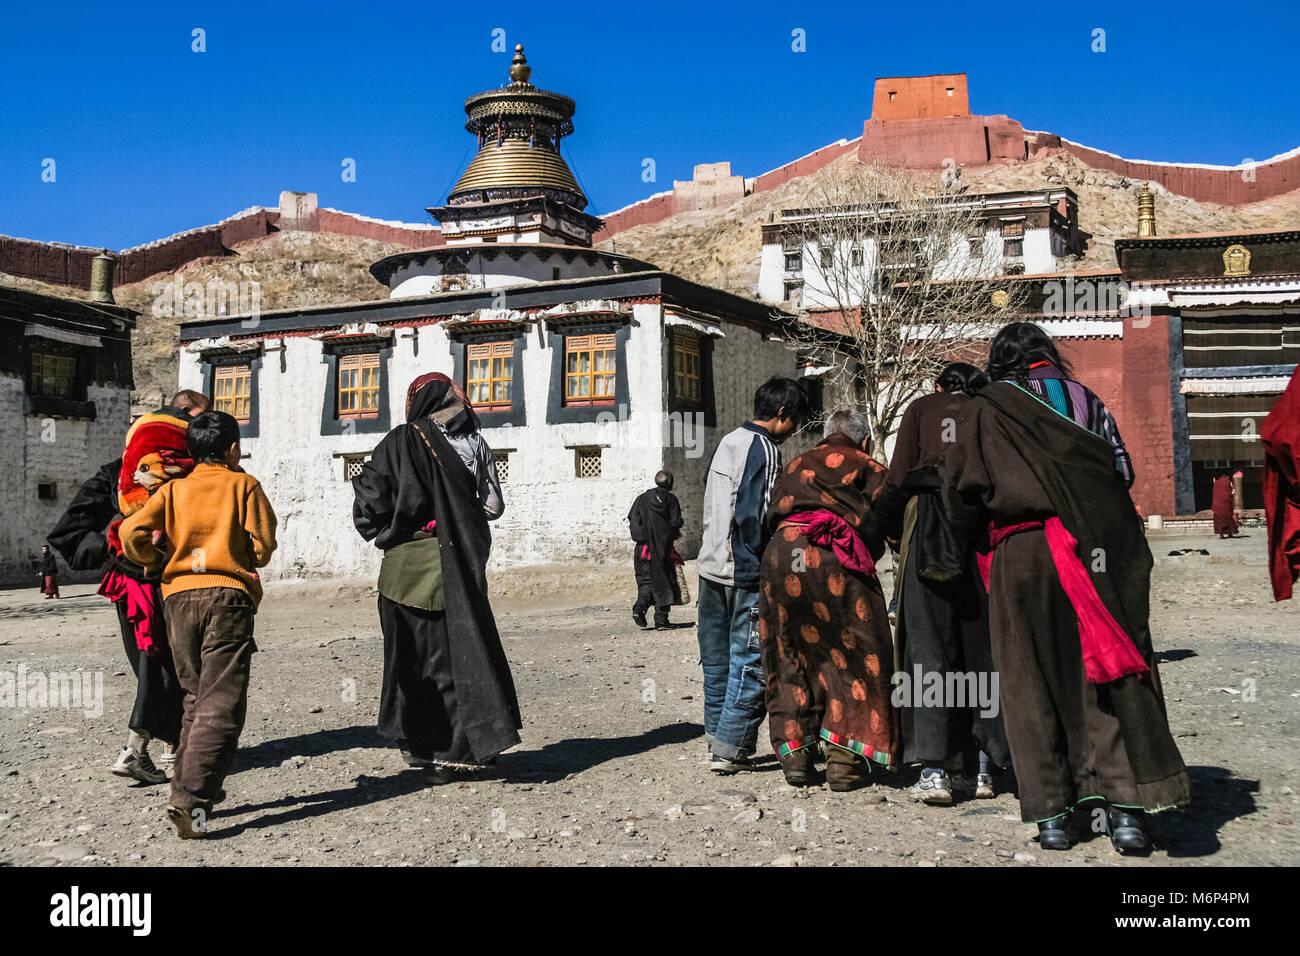 Tibetan pilgrims at Pelkor Chode Monastery, Gyantse, Tibet - Stock Image